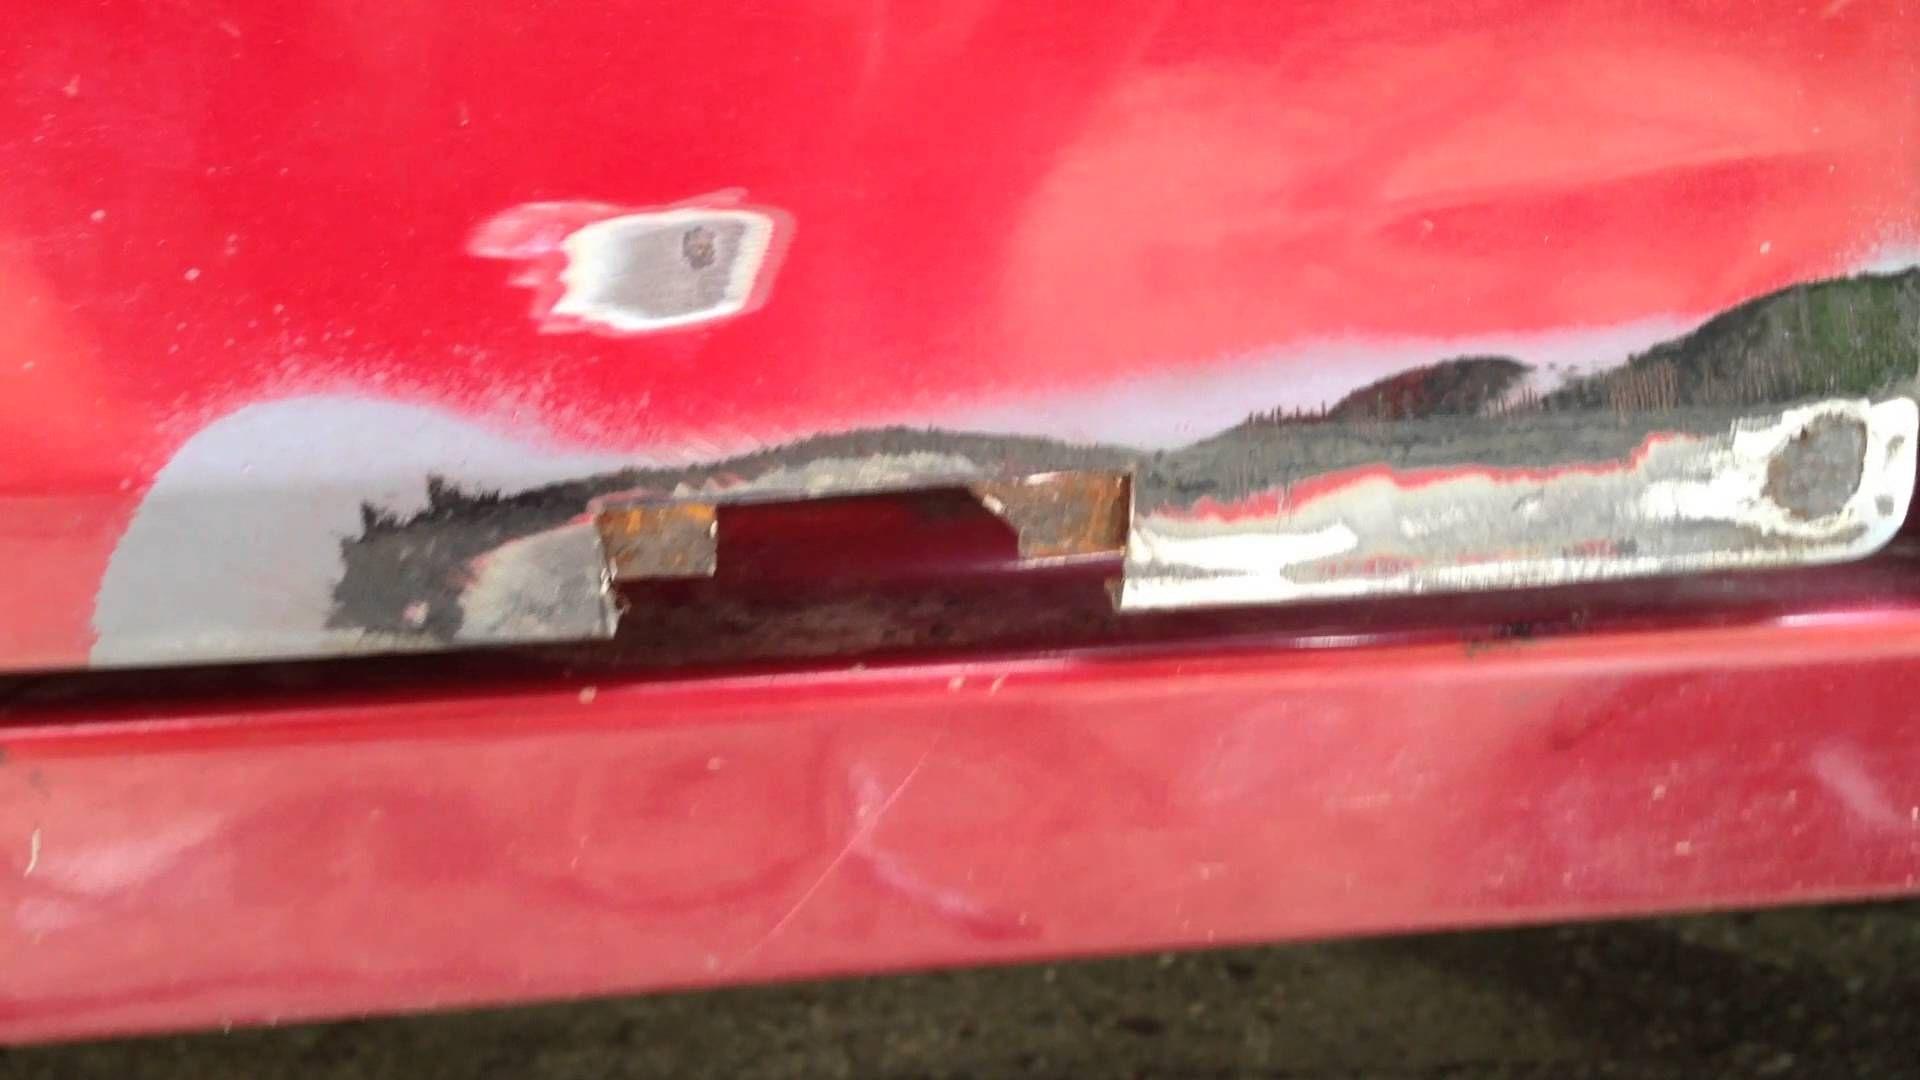 Fixing door RUST (Jeep Cherokee) Jeep xj, Jeep cherokee